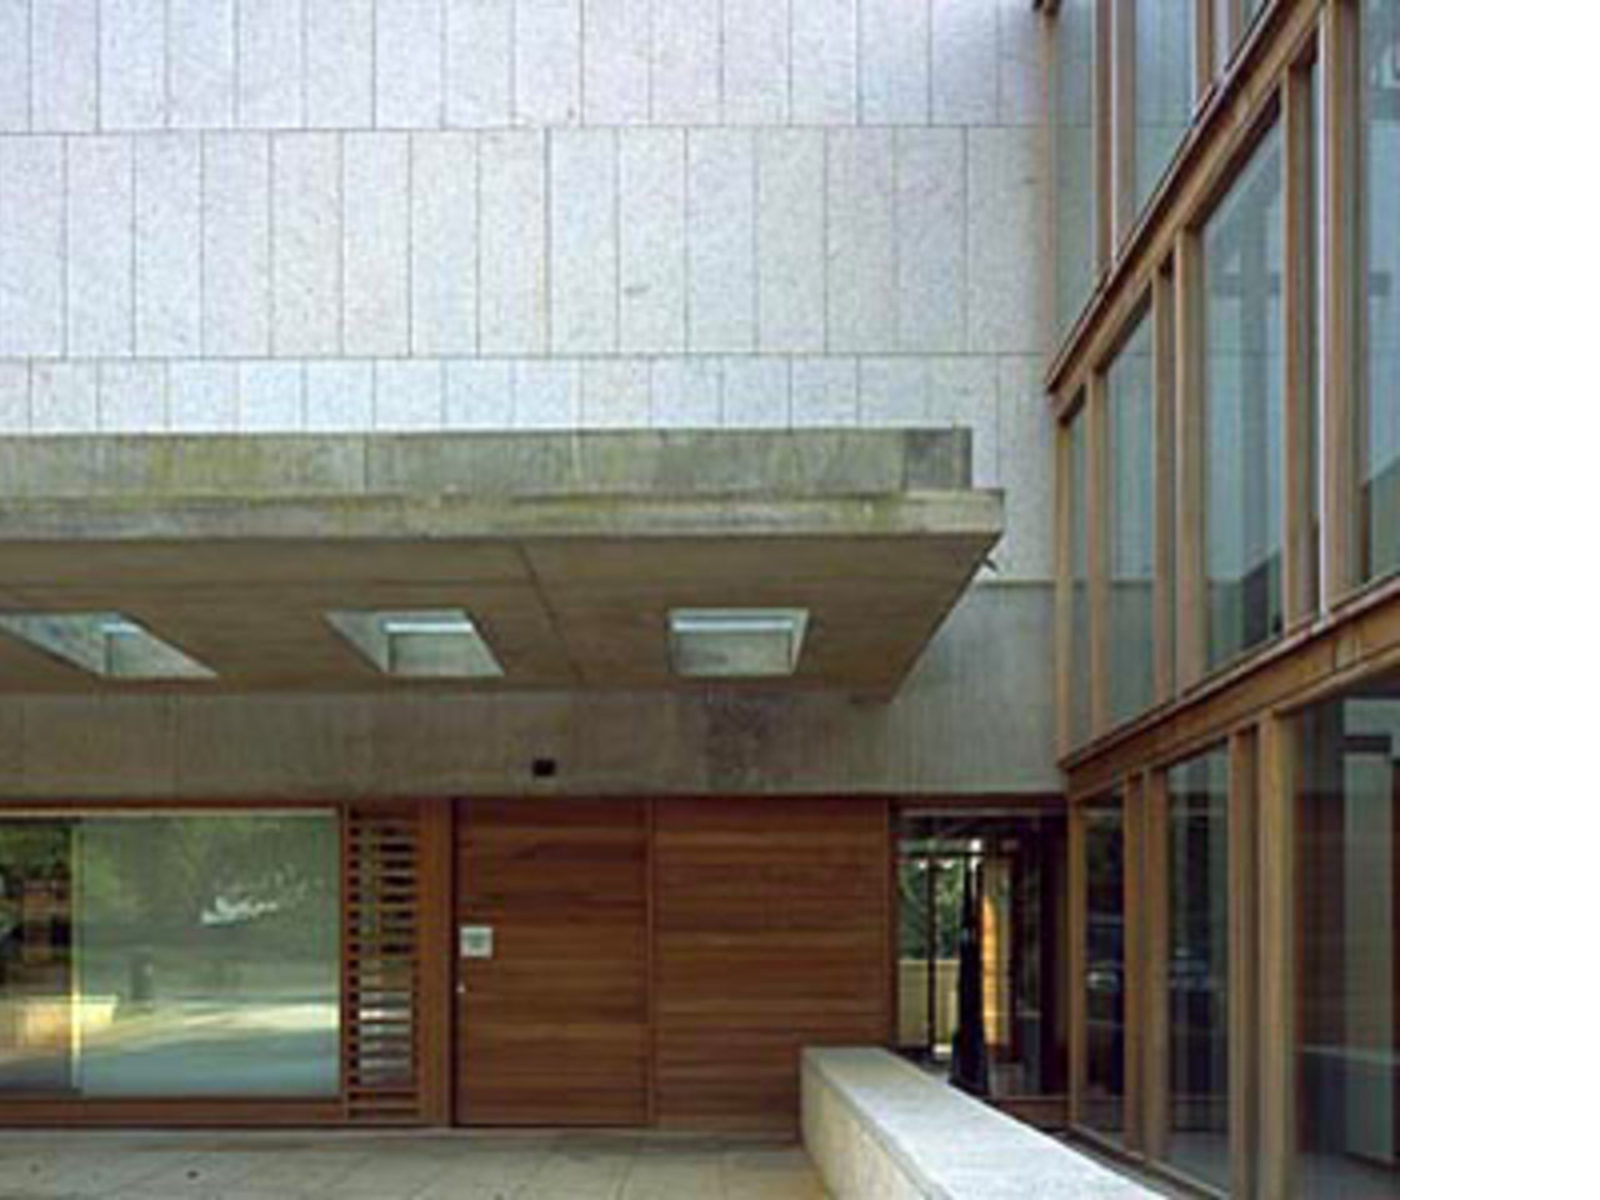 Dunshaughlin Civic Offices<br> Grafton Architects, Ireland, 2001